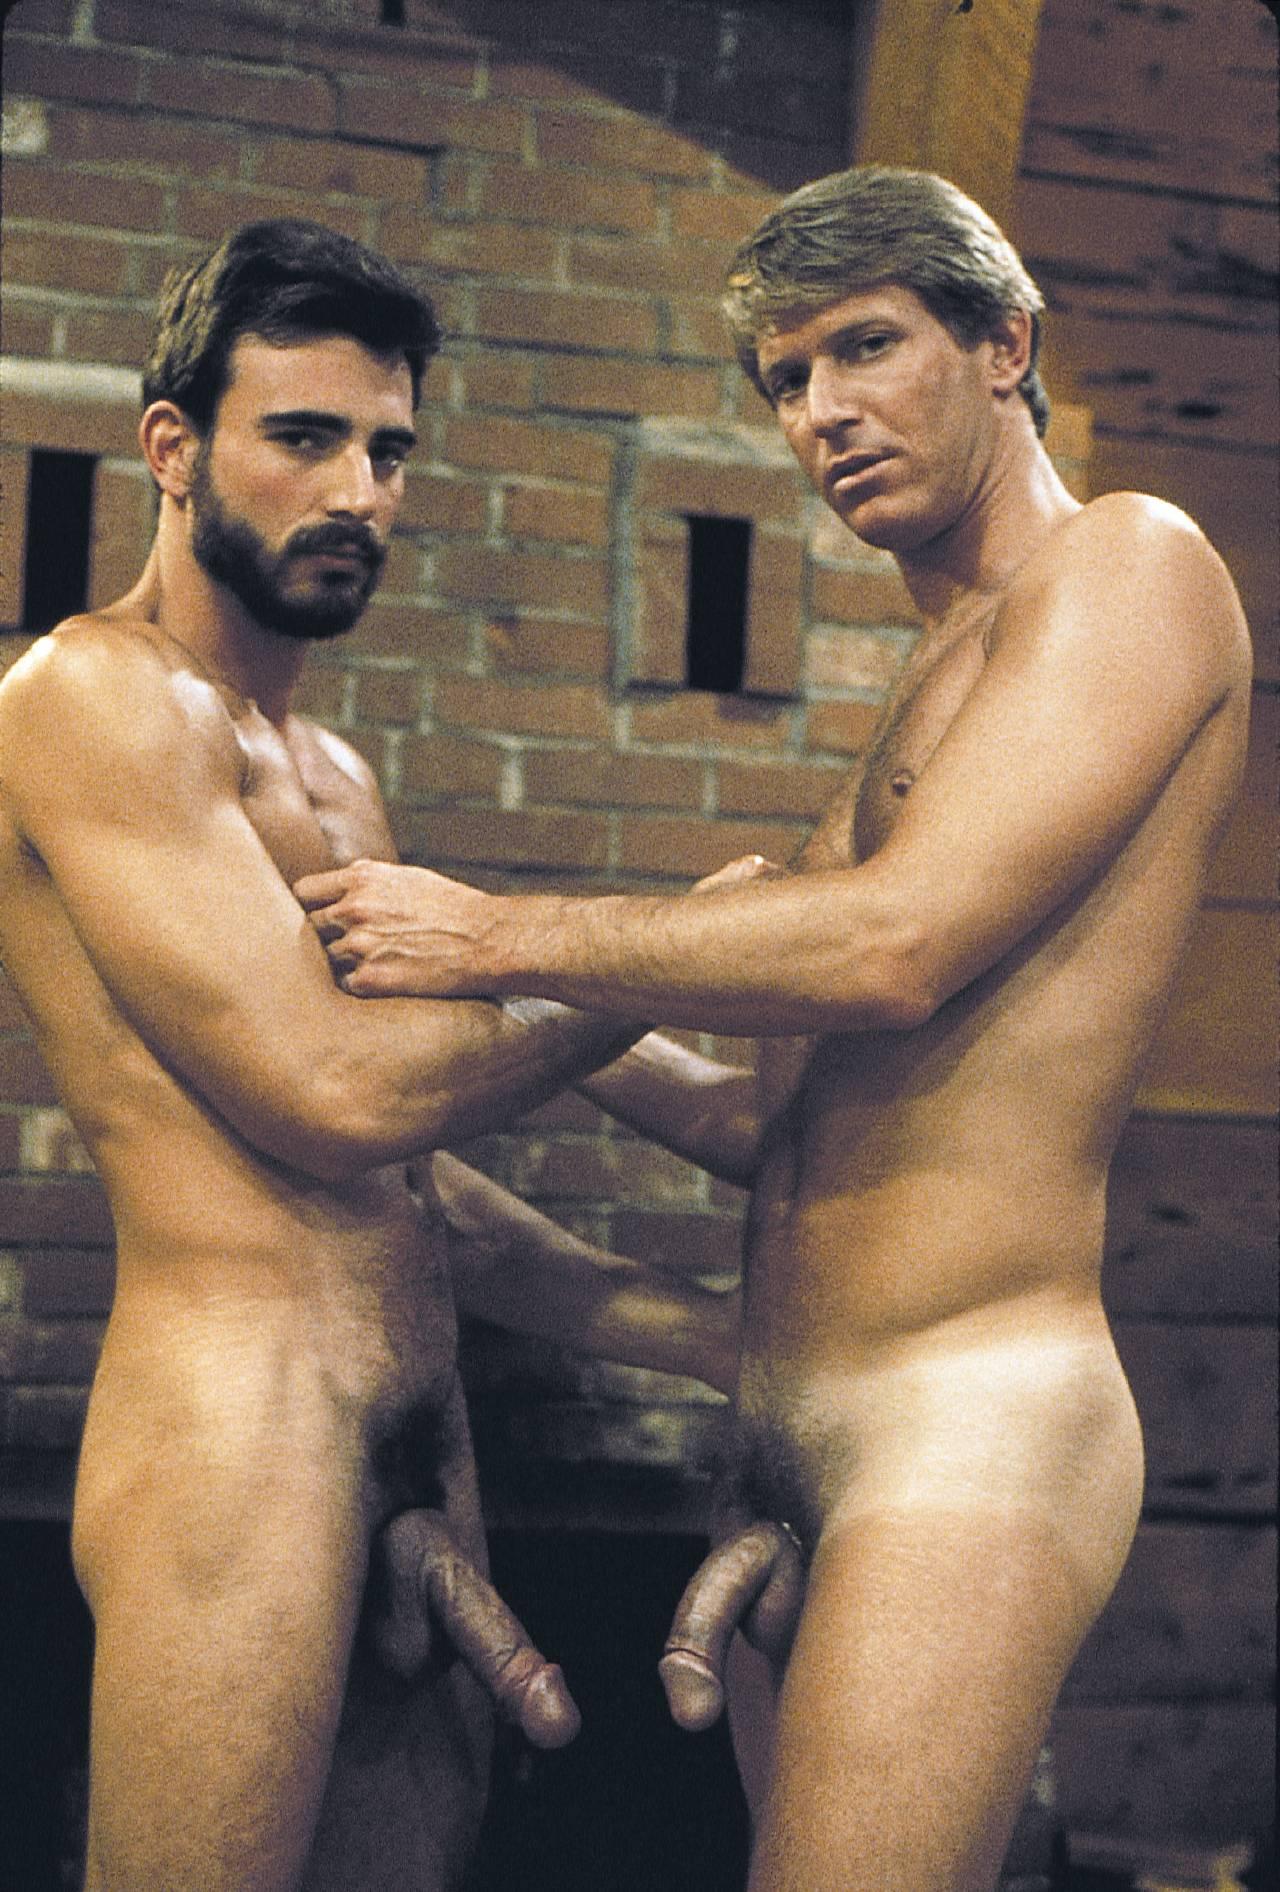 Dick Fisk Casey Donovan Chad Benson Al Parker vintage bareback fuck orgy gay hot daddy dude men porn Other Side Aspen